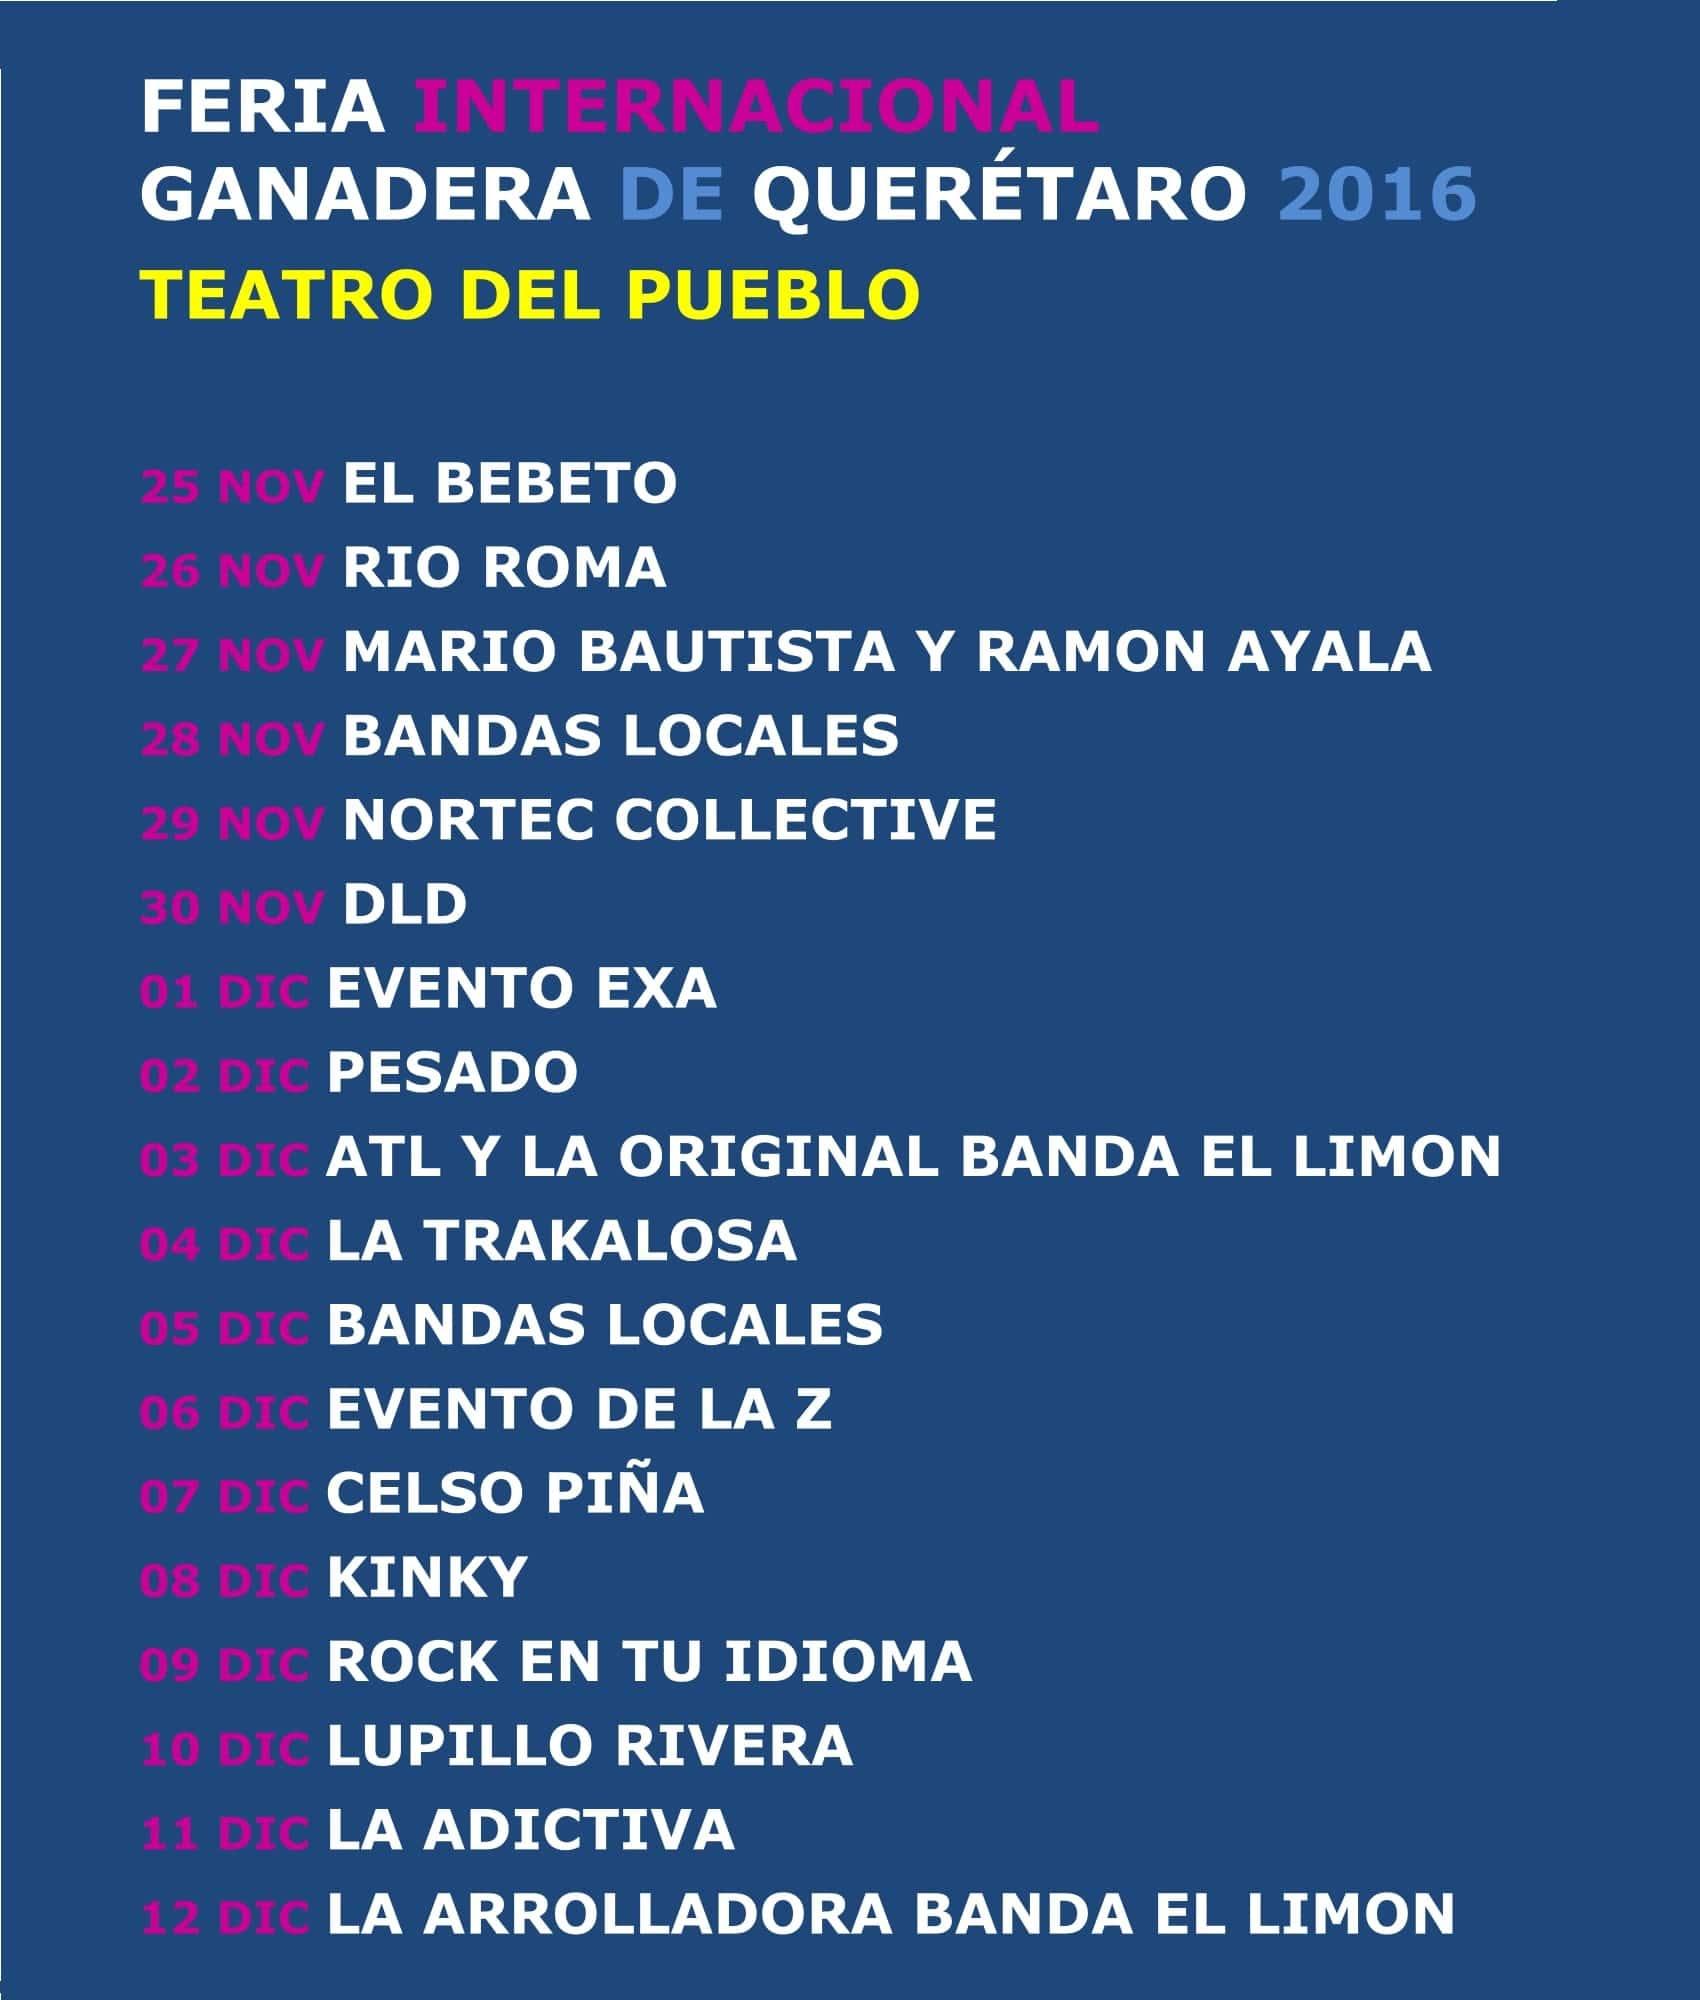 Teatro del Pueblo Feria Queretaro 2016